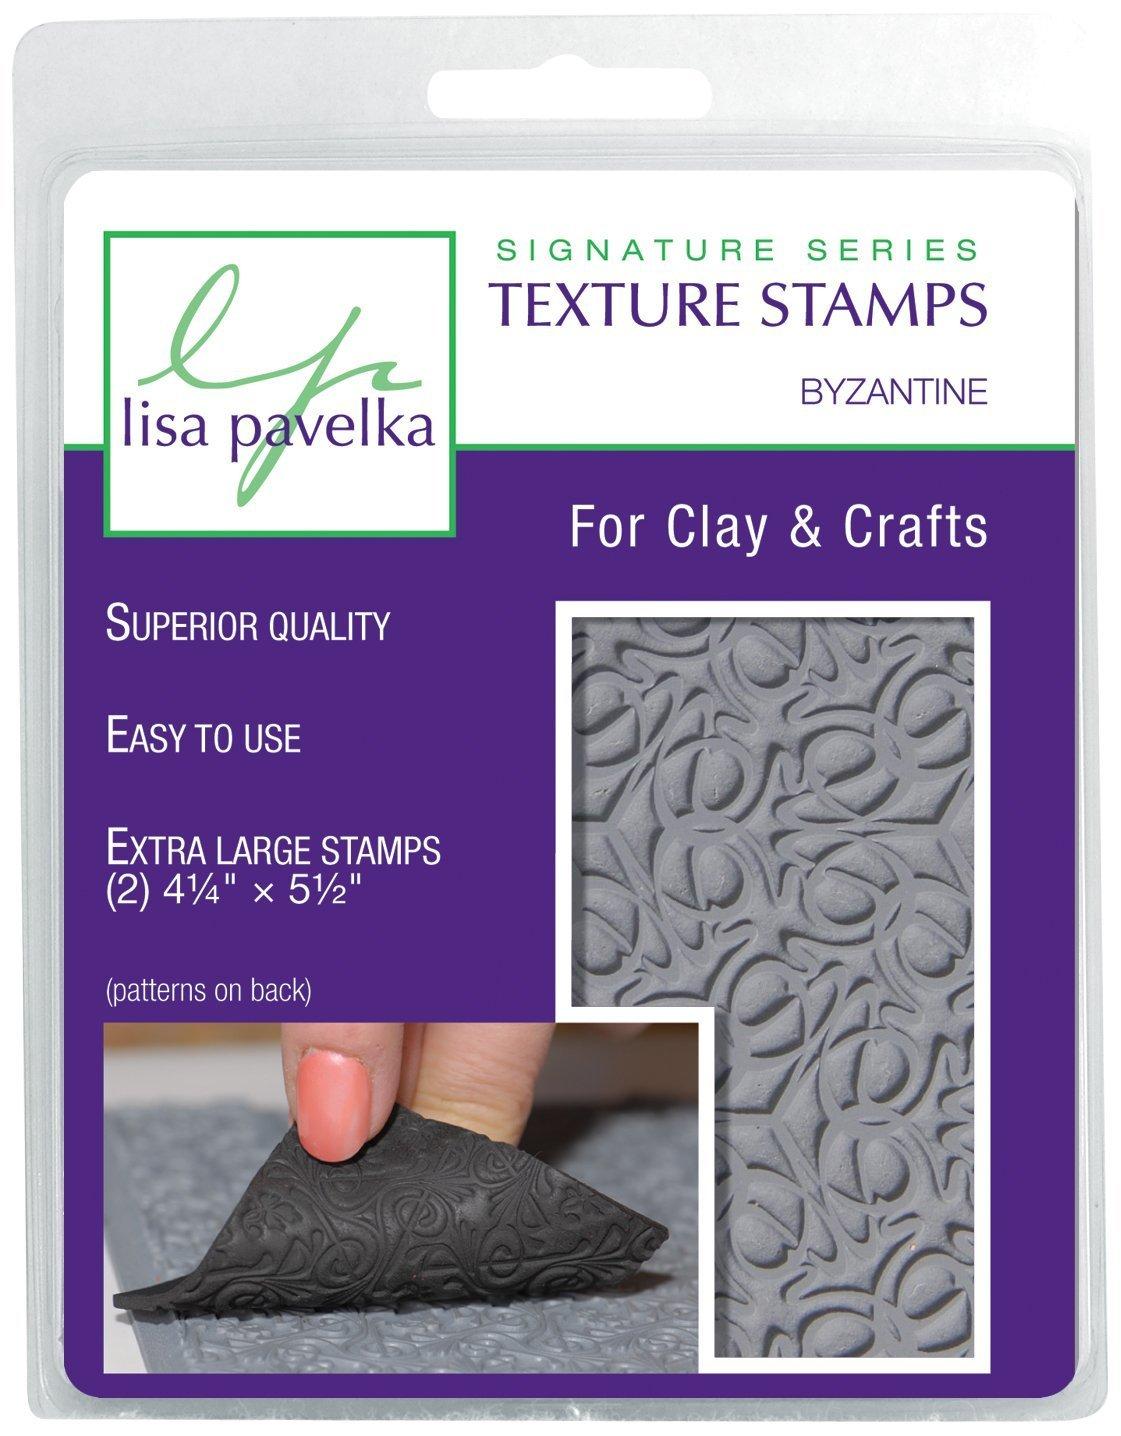 Lisa Pavelka Texture Stamp Kit Byzantine (Style 070) The Great Create Inc.